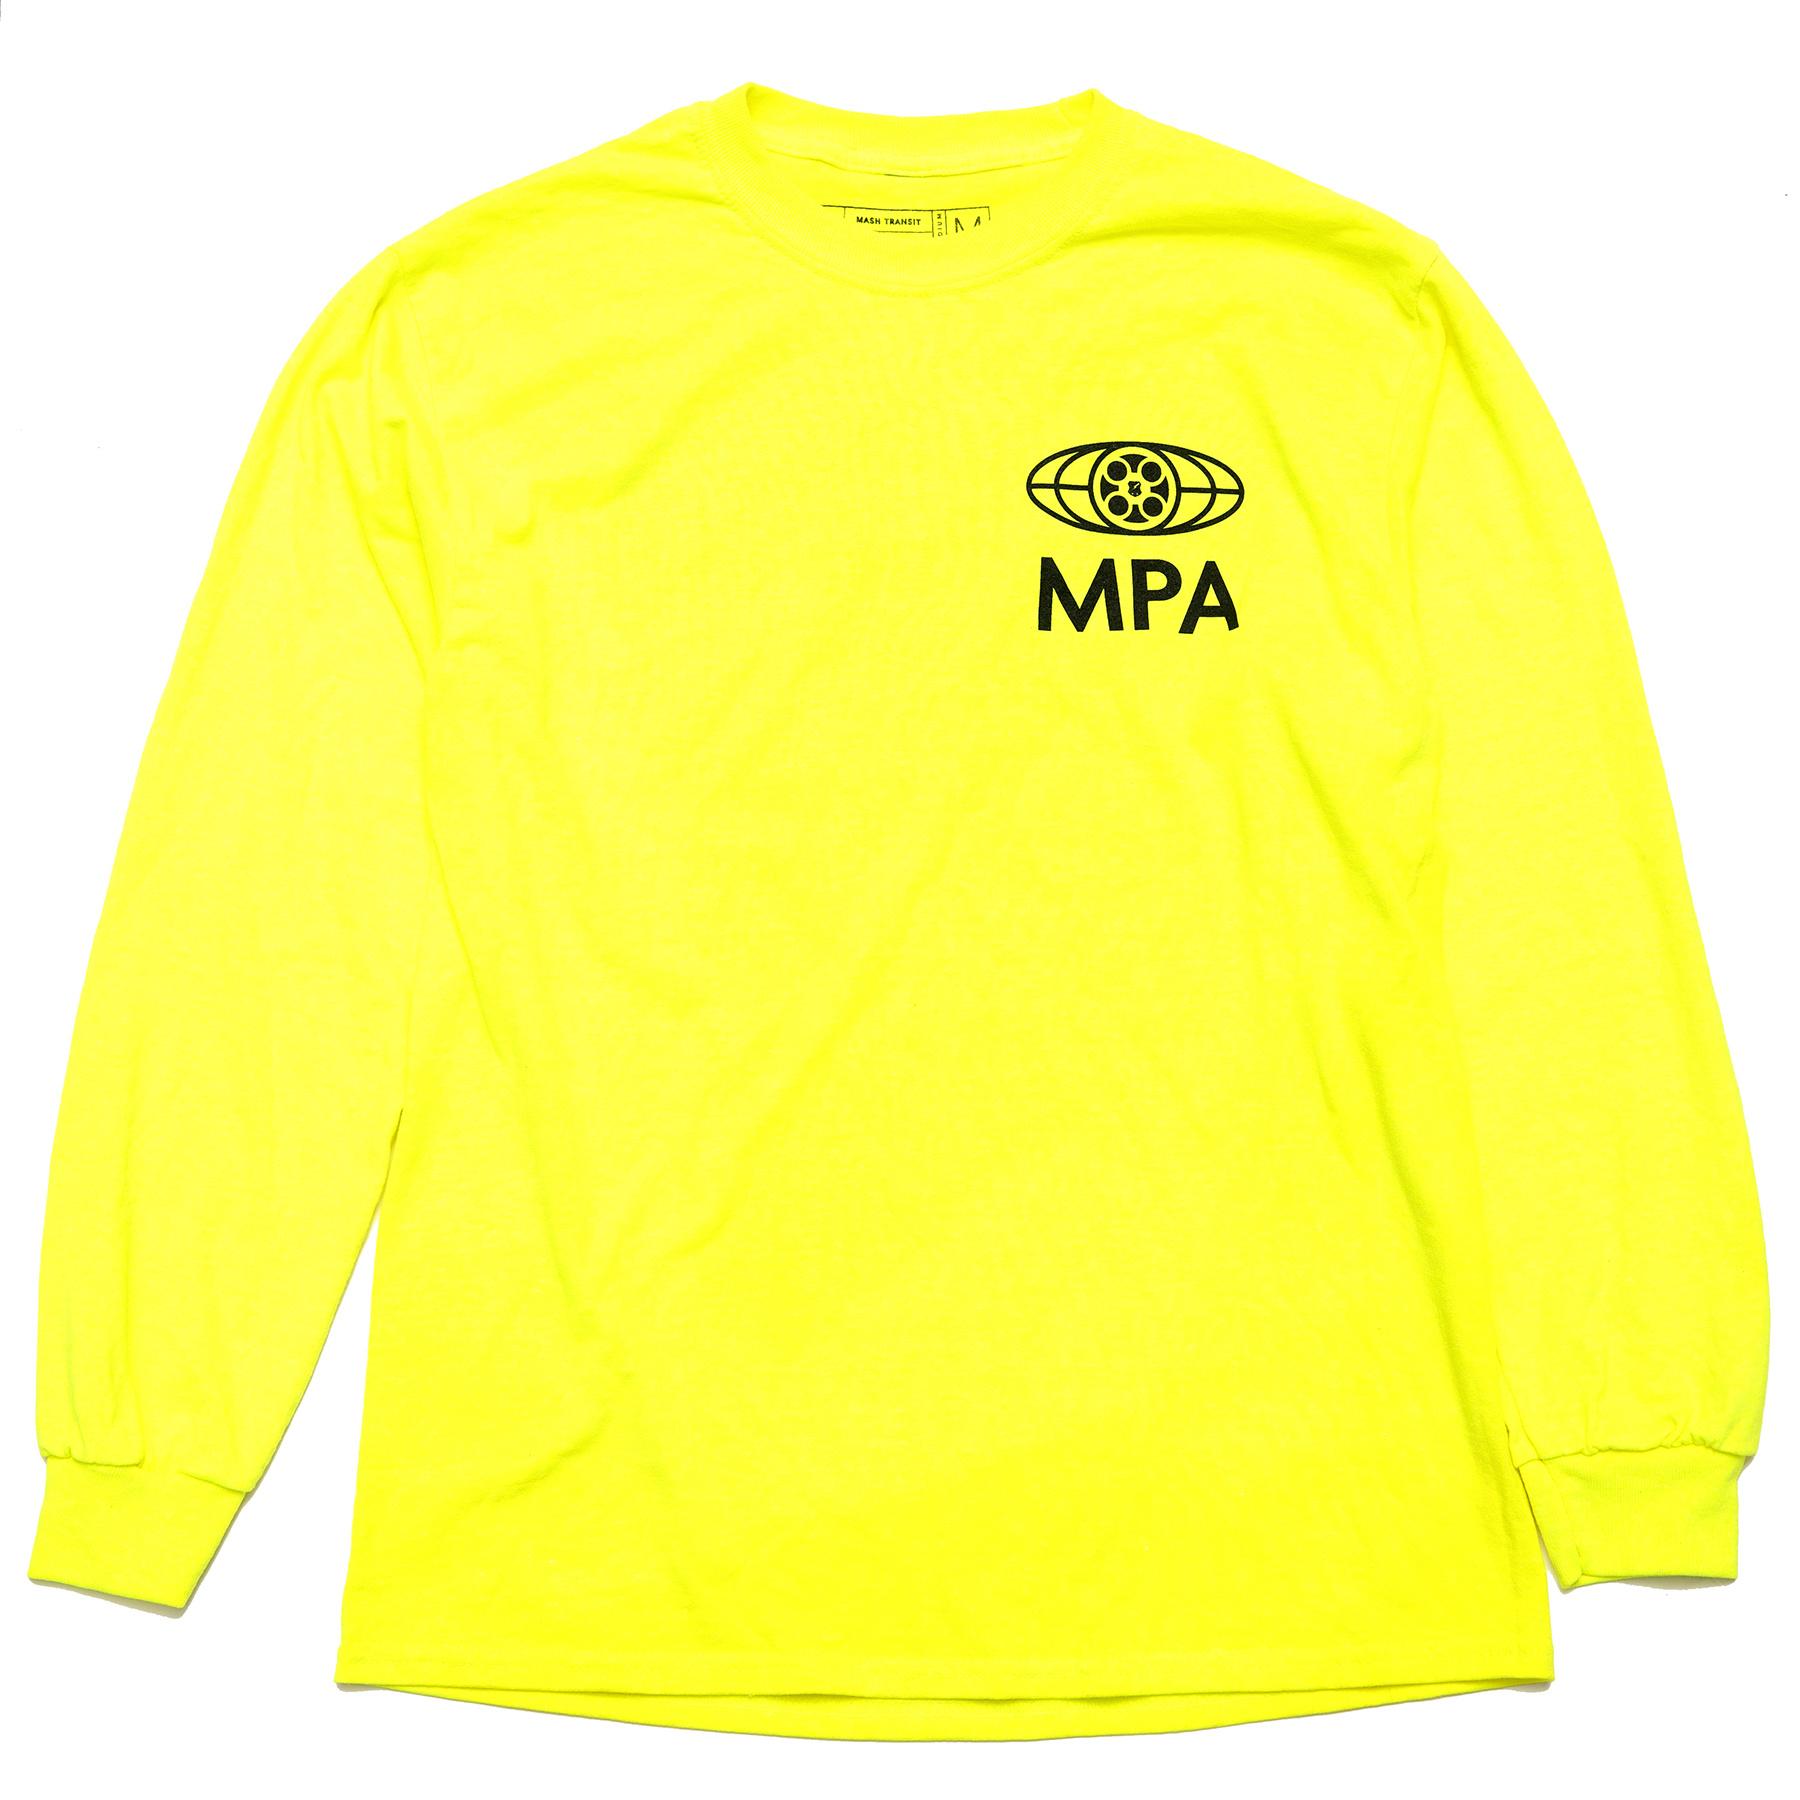 MASH MPA Longsleeve Shirt